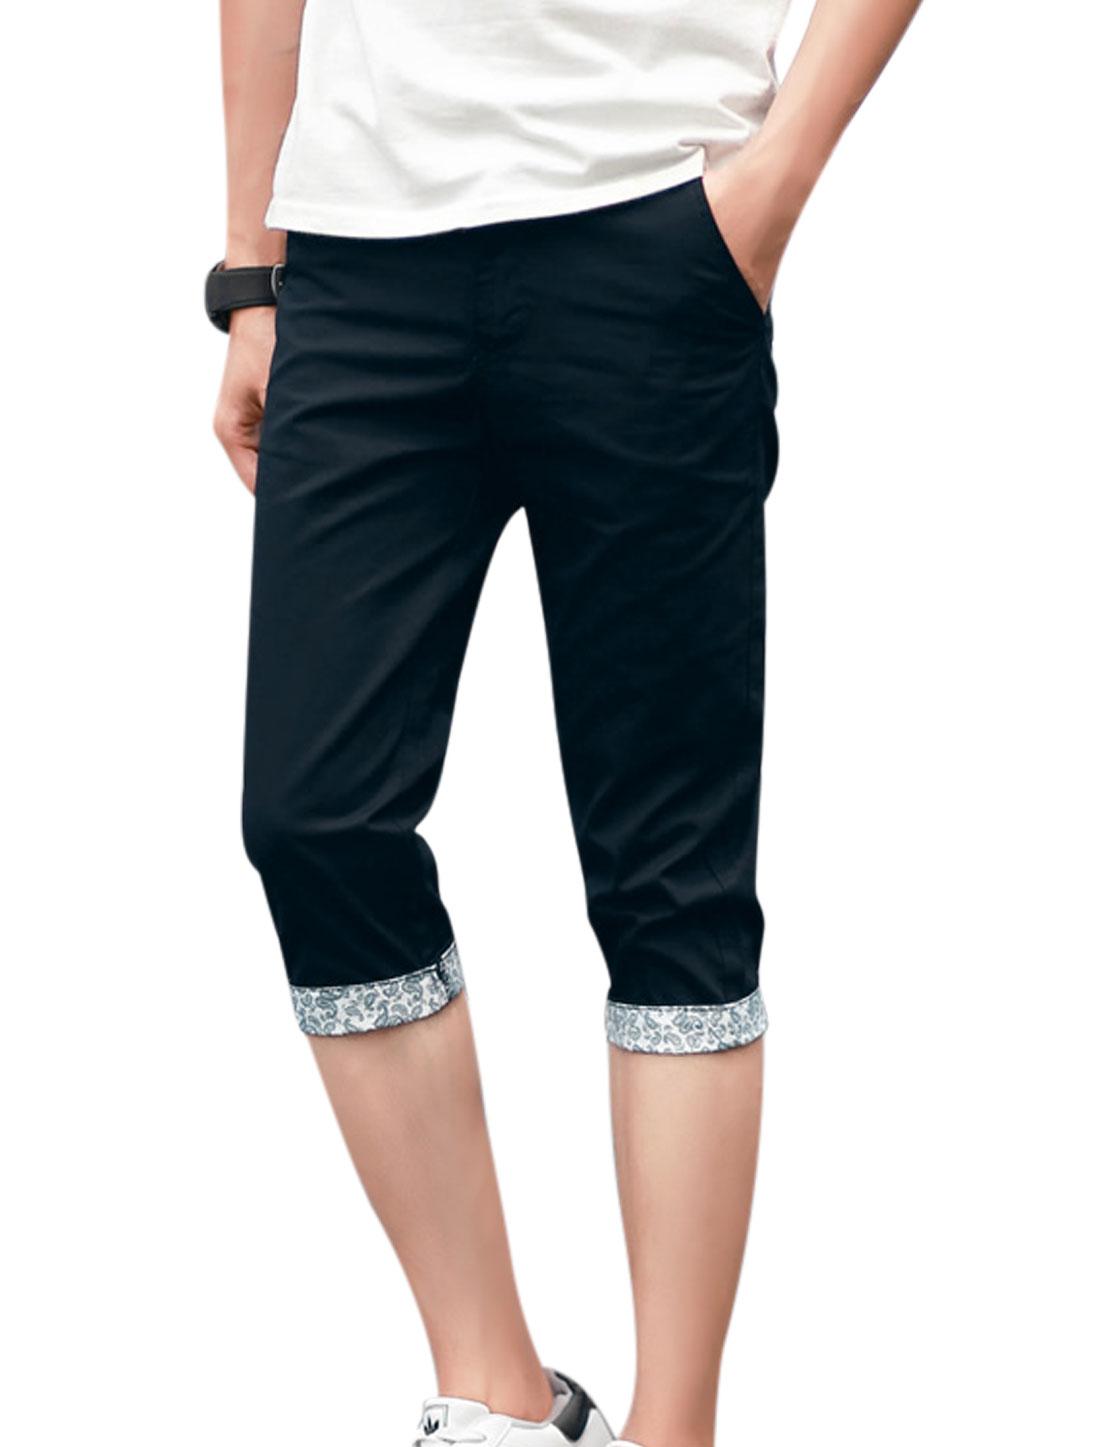 Men Mid Rise Zip Fly Pockets Casual Capris Pants Navy Blue W32